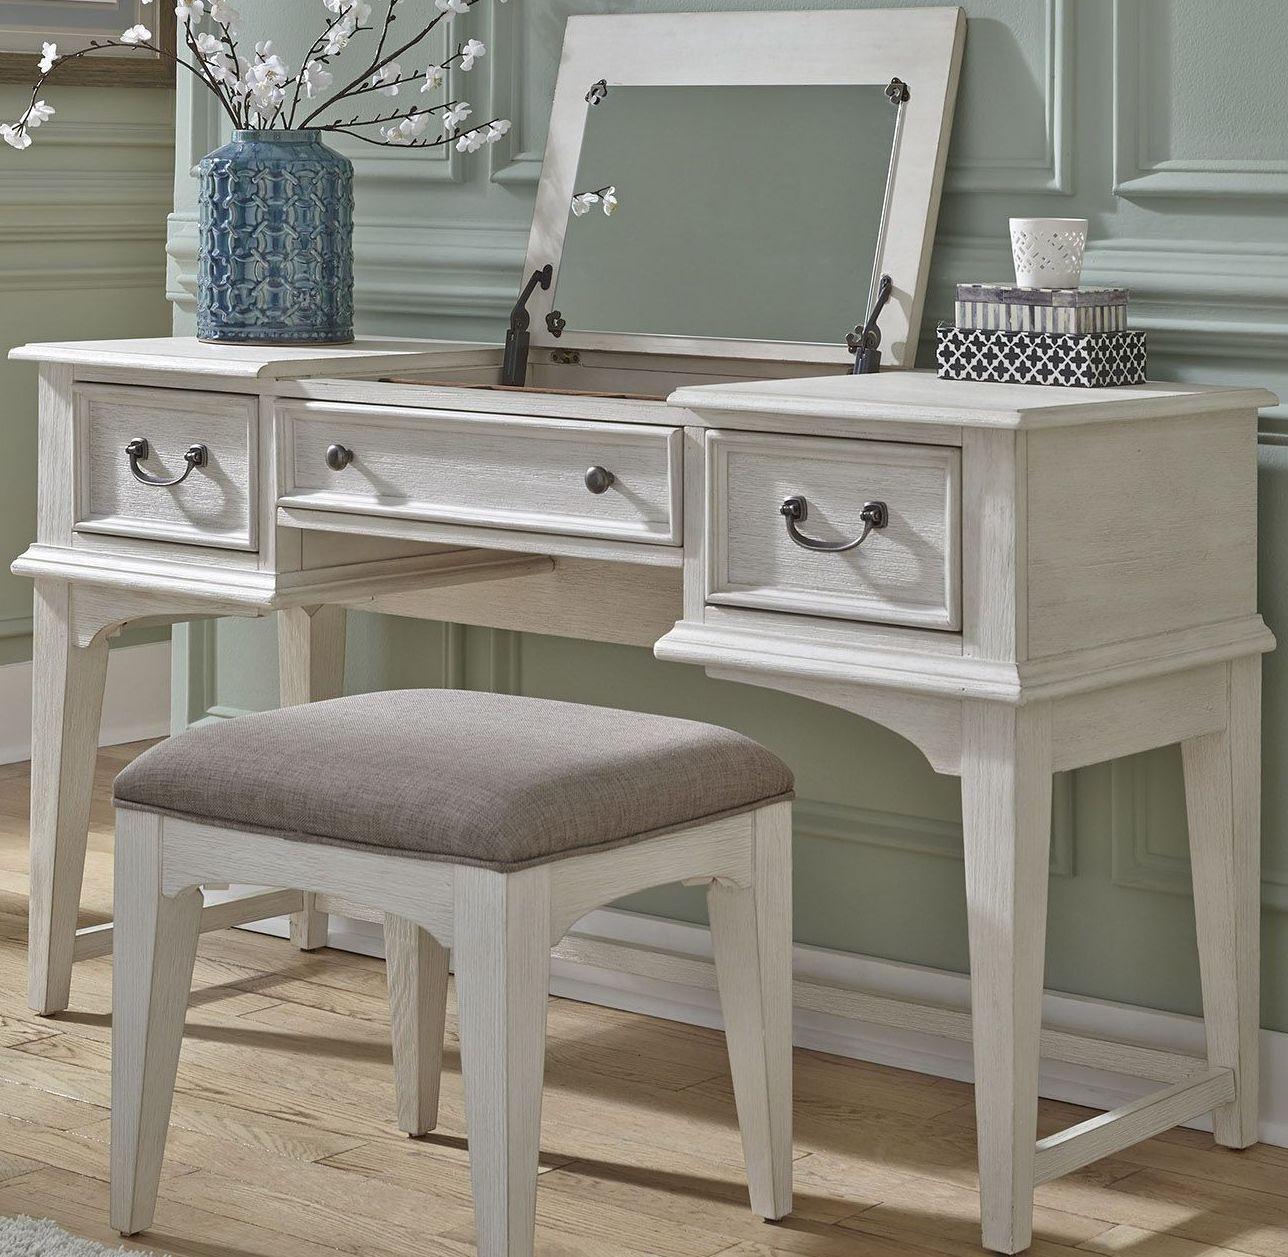 Bayside Youth White Vanity Desk, 249-BR35, Liberty